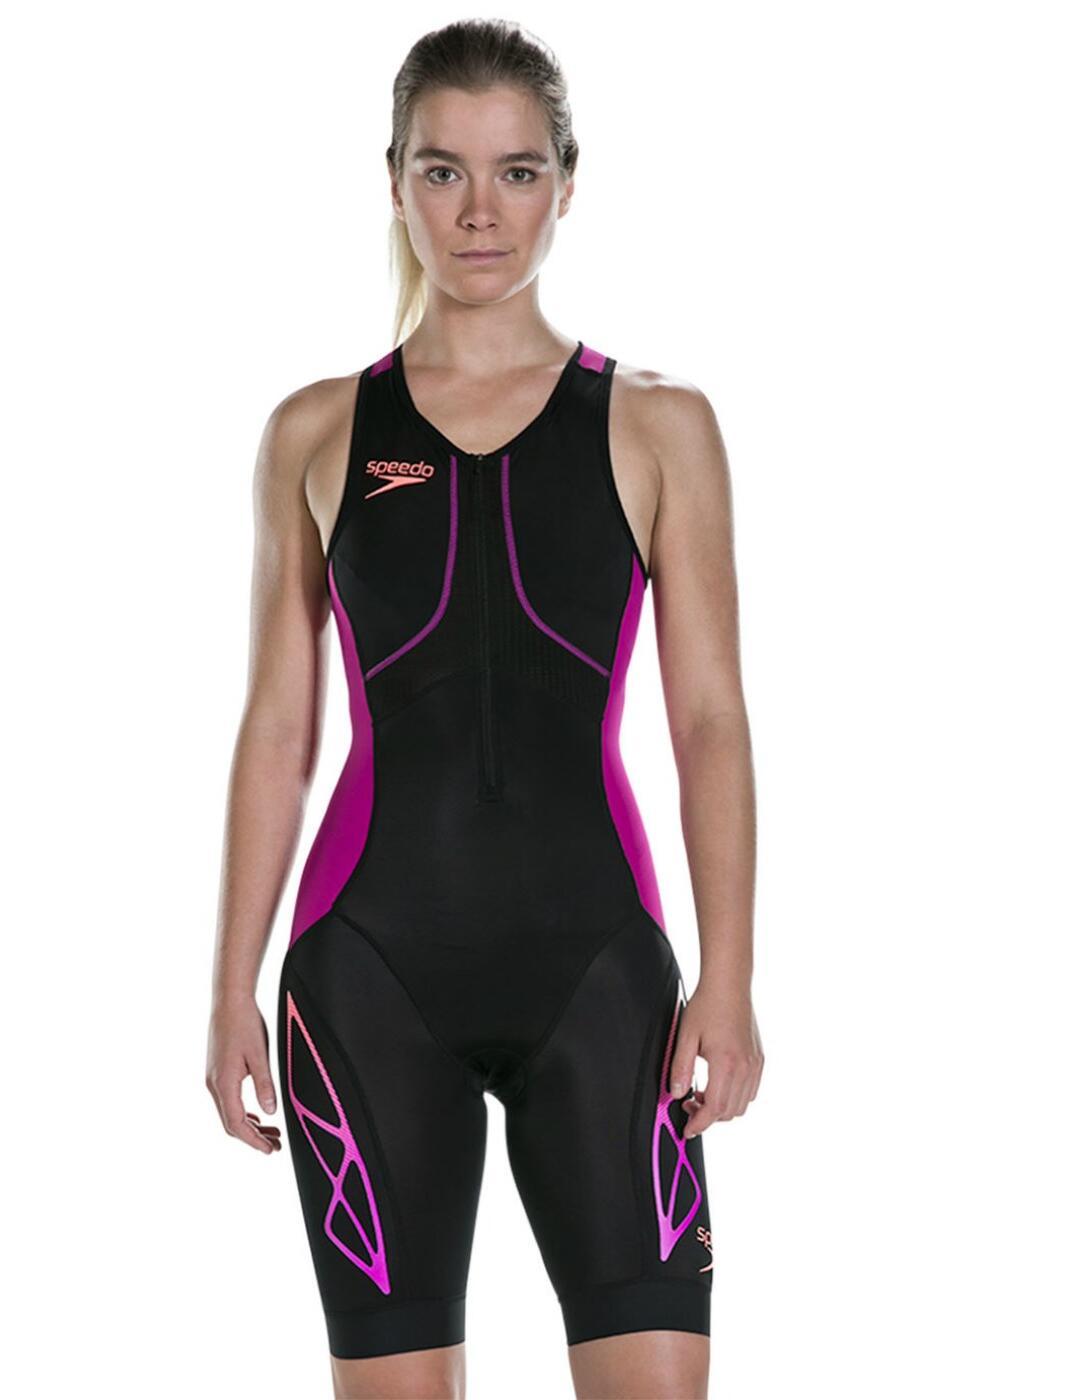 811422C148 Speedo Fastskin Xenon Female Tri Suit - 811422C148 Black/Fuchsia